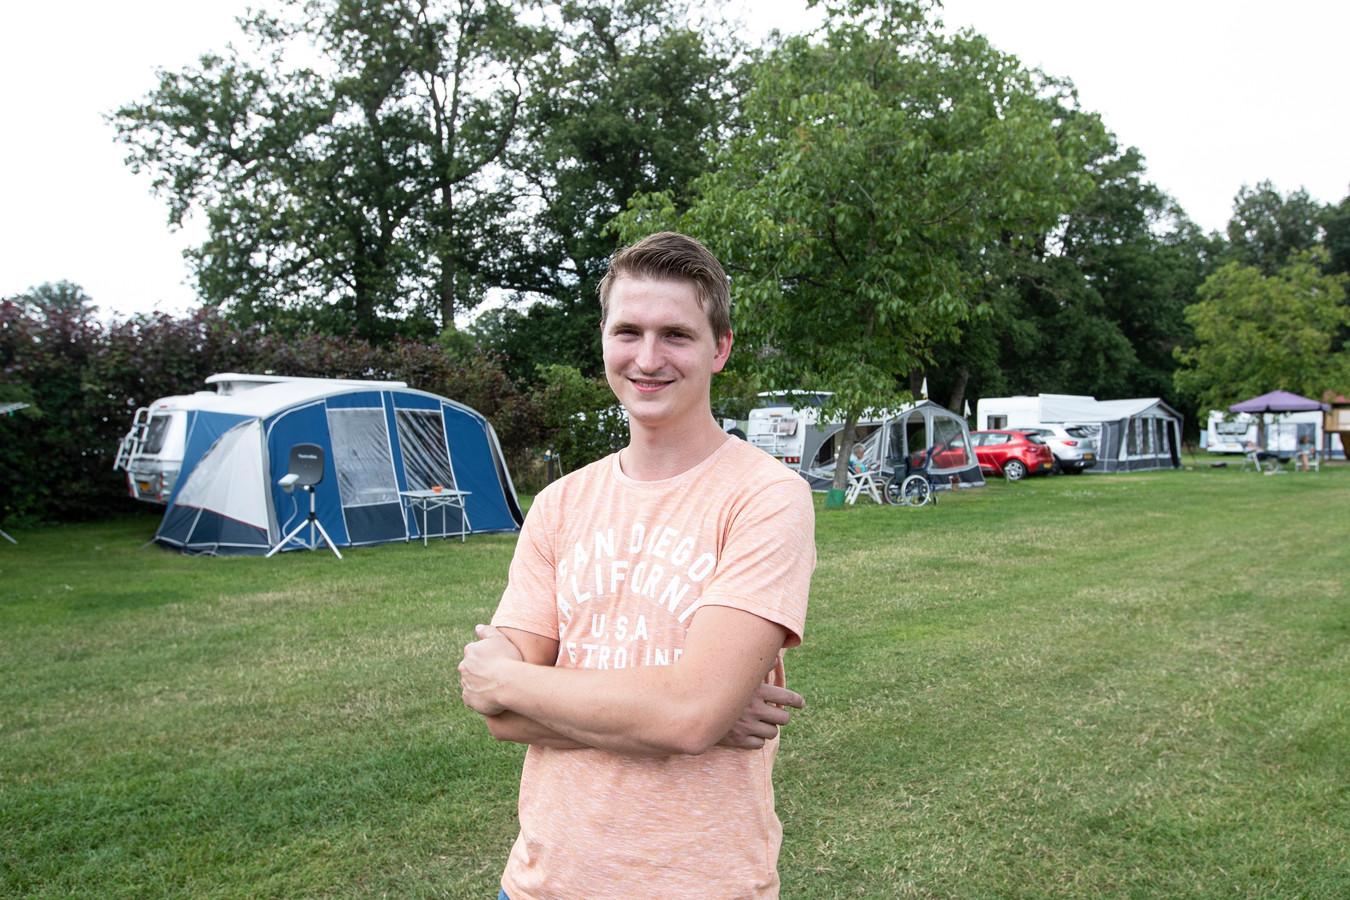 Roy Lammers, zoon van Gerrit, die vier dagen per week op camping en camperplaats De Grimberghoeve werkt.